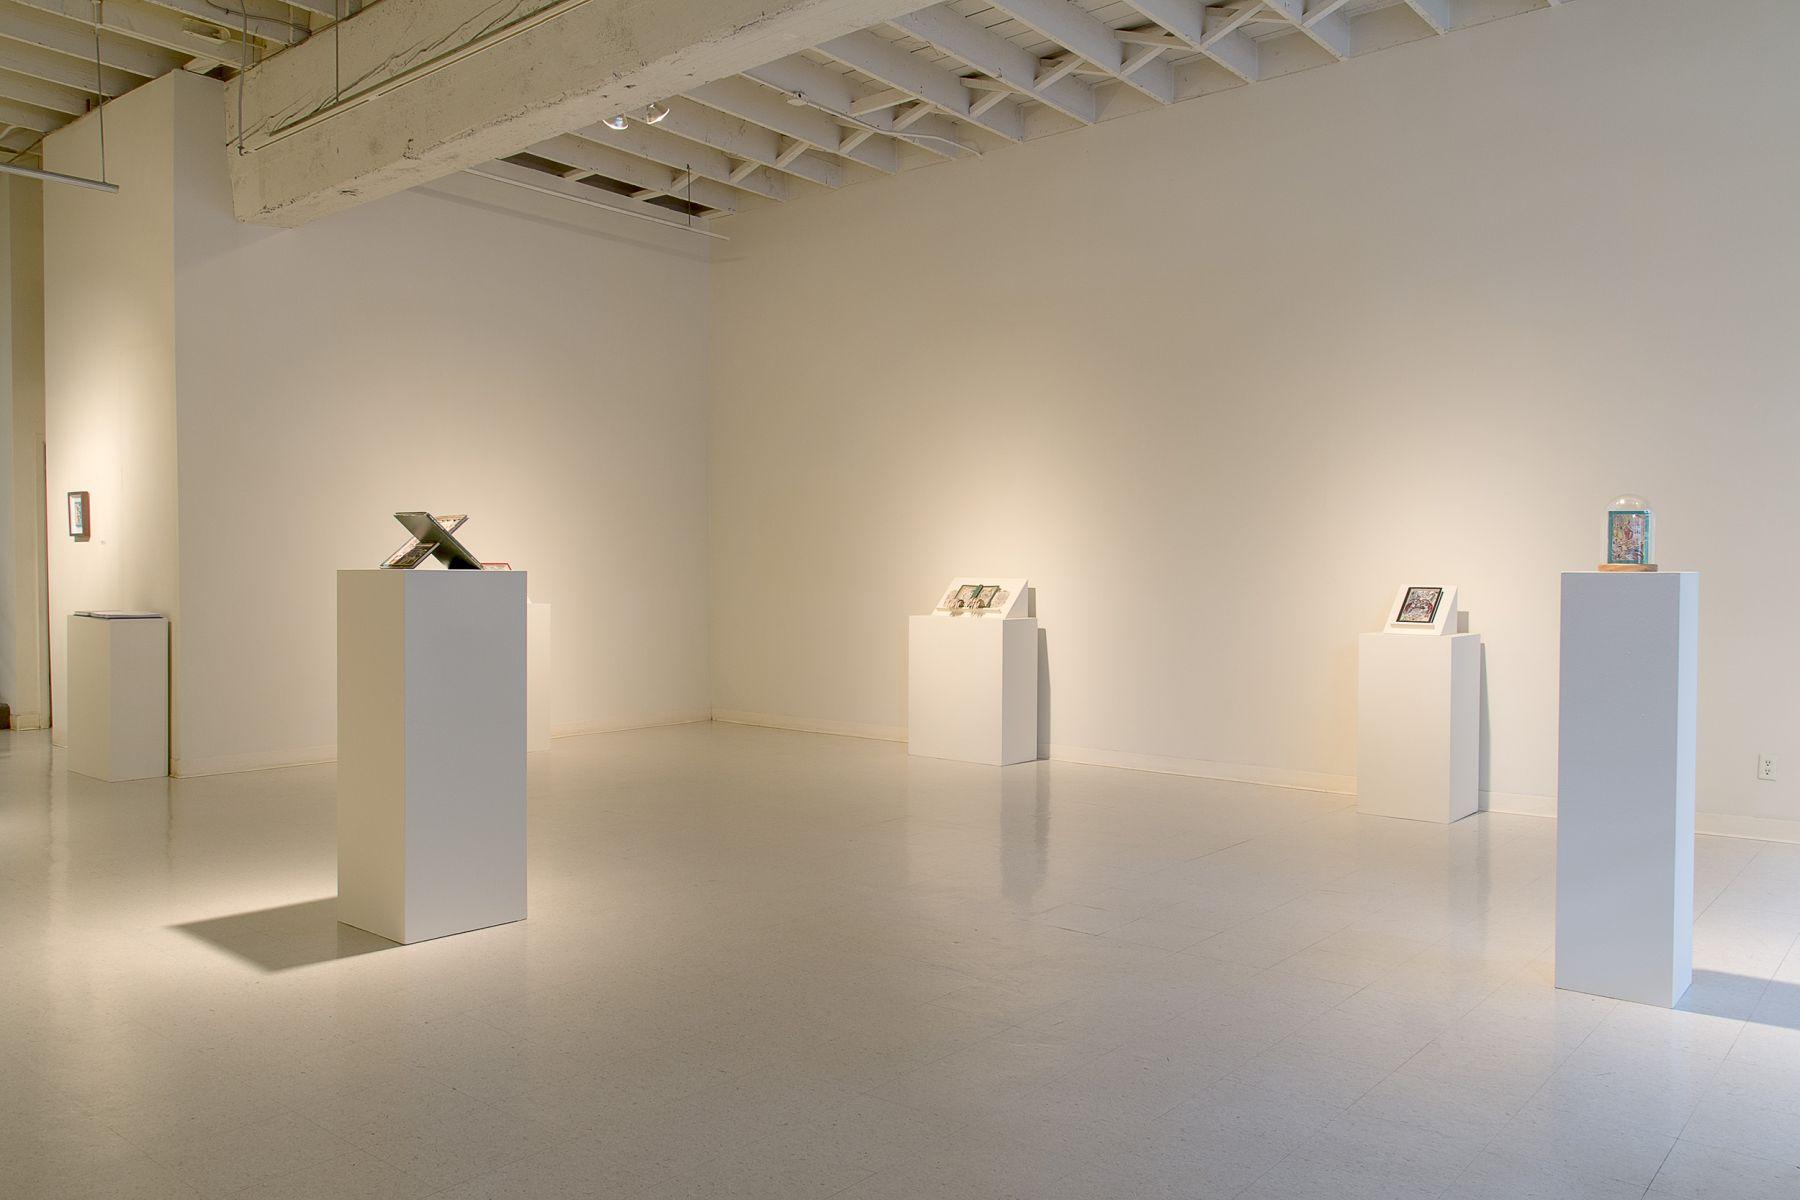 James Allen exhibition at Laura Russo Gallery October 2015